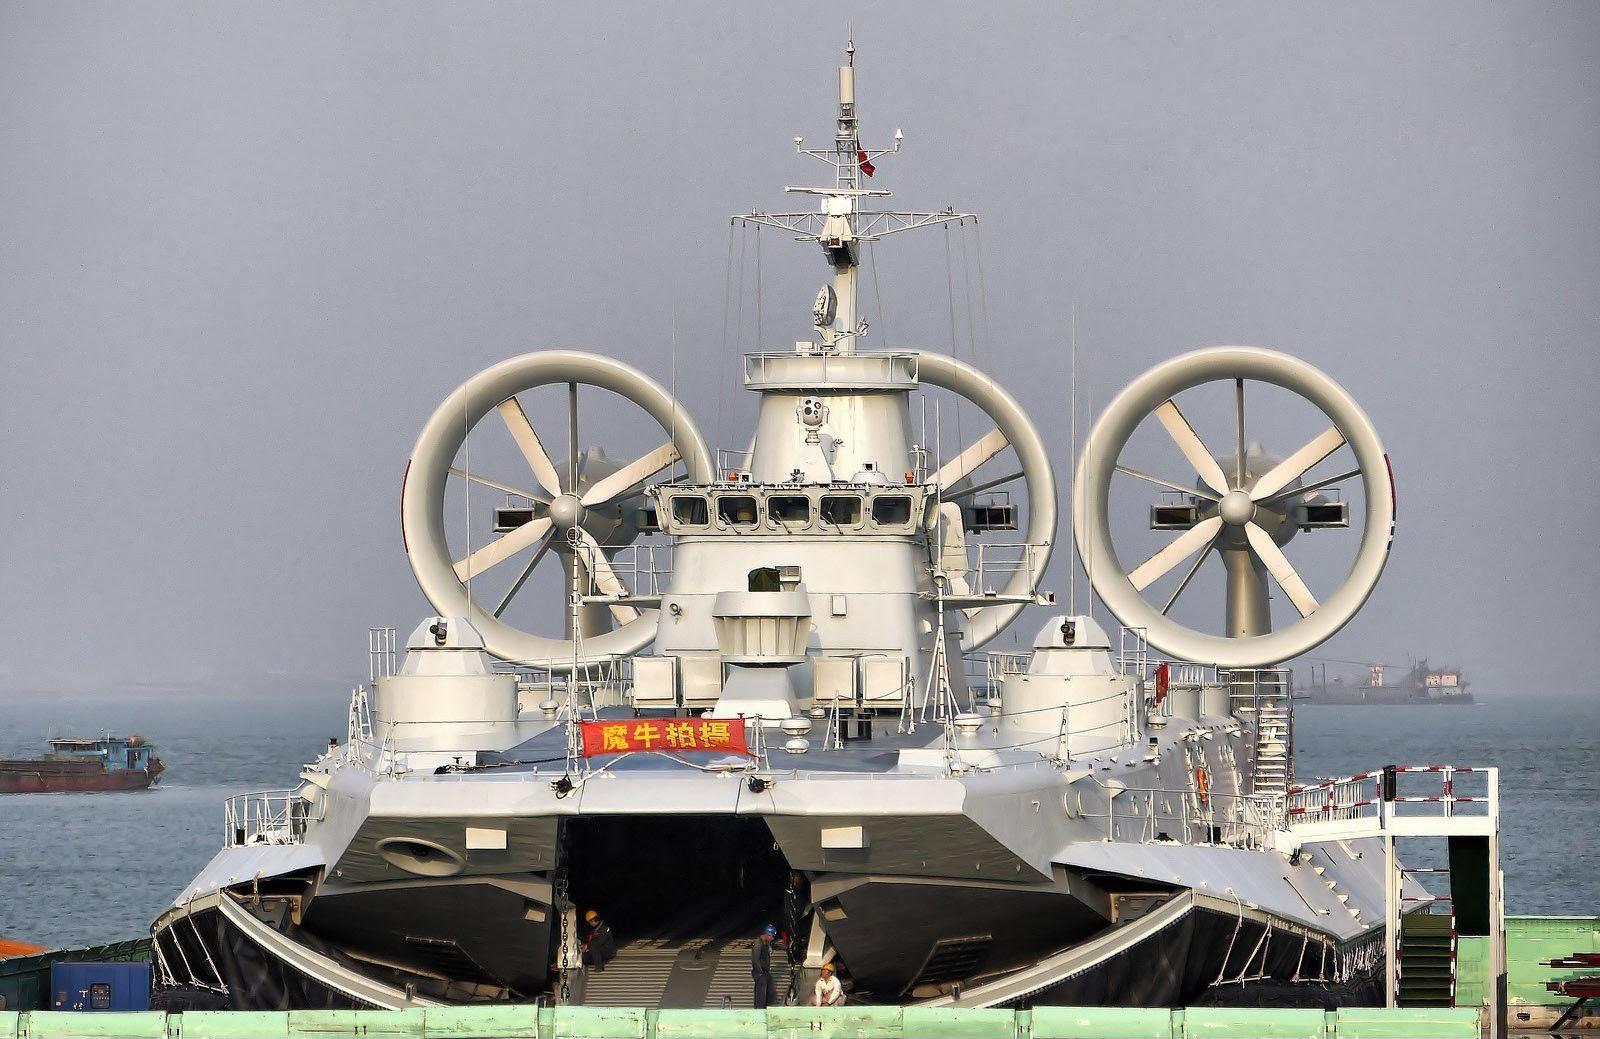 http://1.bp.blogspot.com/-oCaPaydSS1k/UsTUrcnrfTI/AAAAAAAAhJ8/3_jOCZDUKfM/s1600/Chinese+Landing+Craft+Air+Cushion+(LCAC)+Zubr+class+(Project+1232.2+class,+Pomornik)+air-cushioned+landing+craft+Soviet+design+People%27s+Liberation+Army+Navy+(PLAN+or+PLA+Navy)+ukraine++(6).jpg